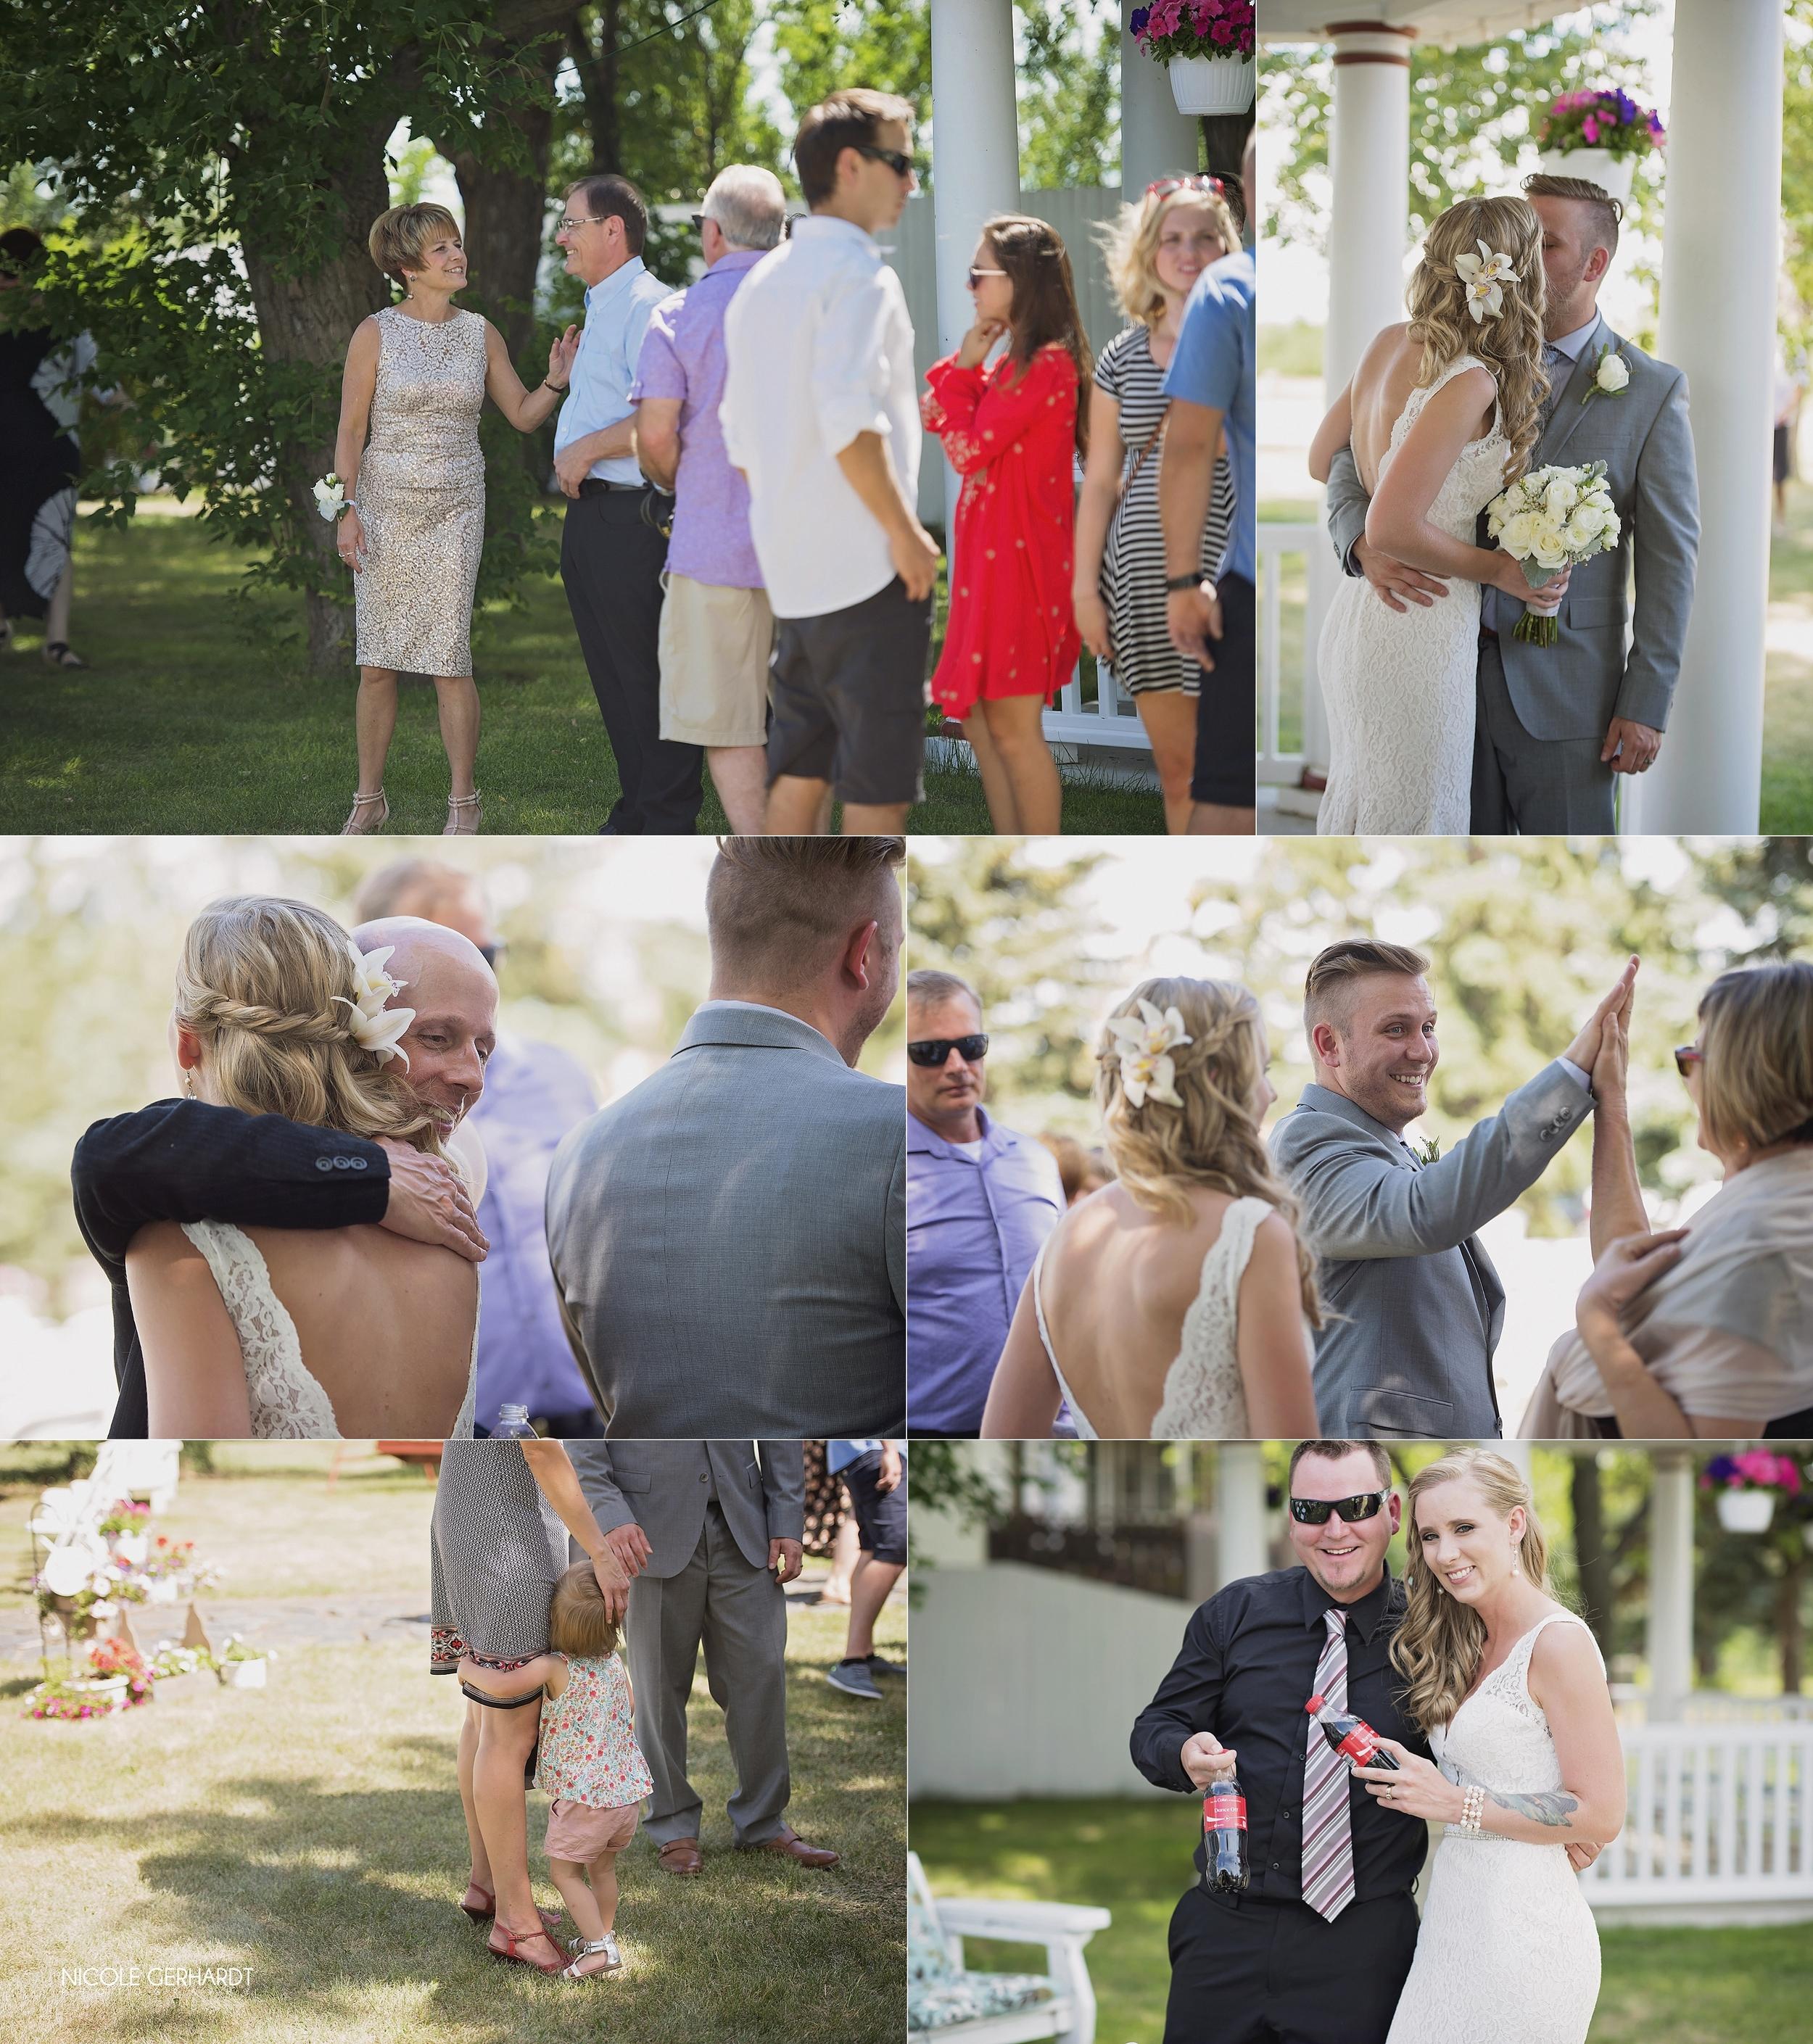 regina_wedding_moosejaw_photographer16.jpg